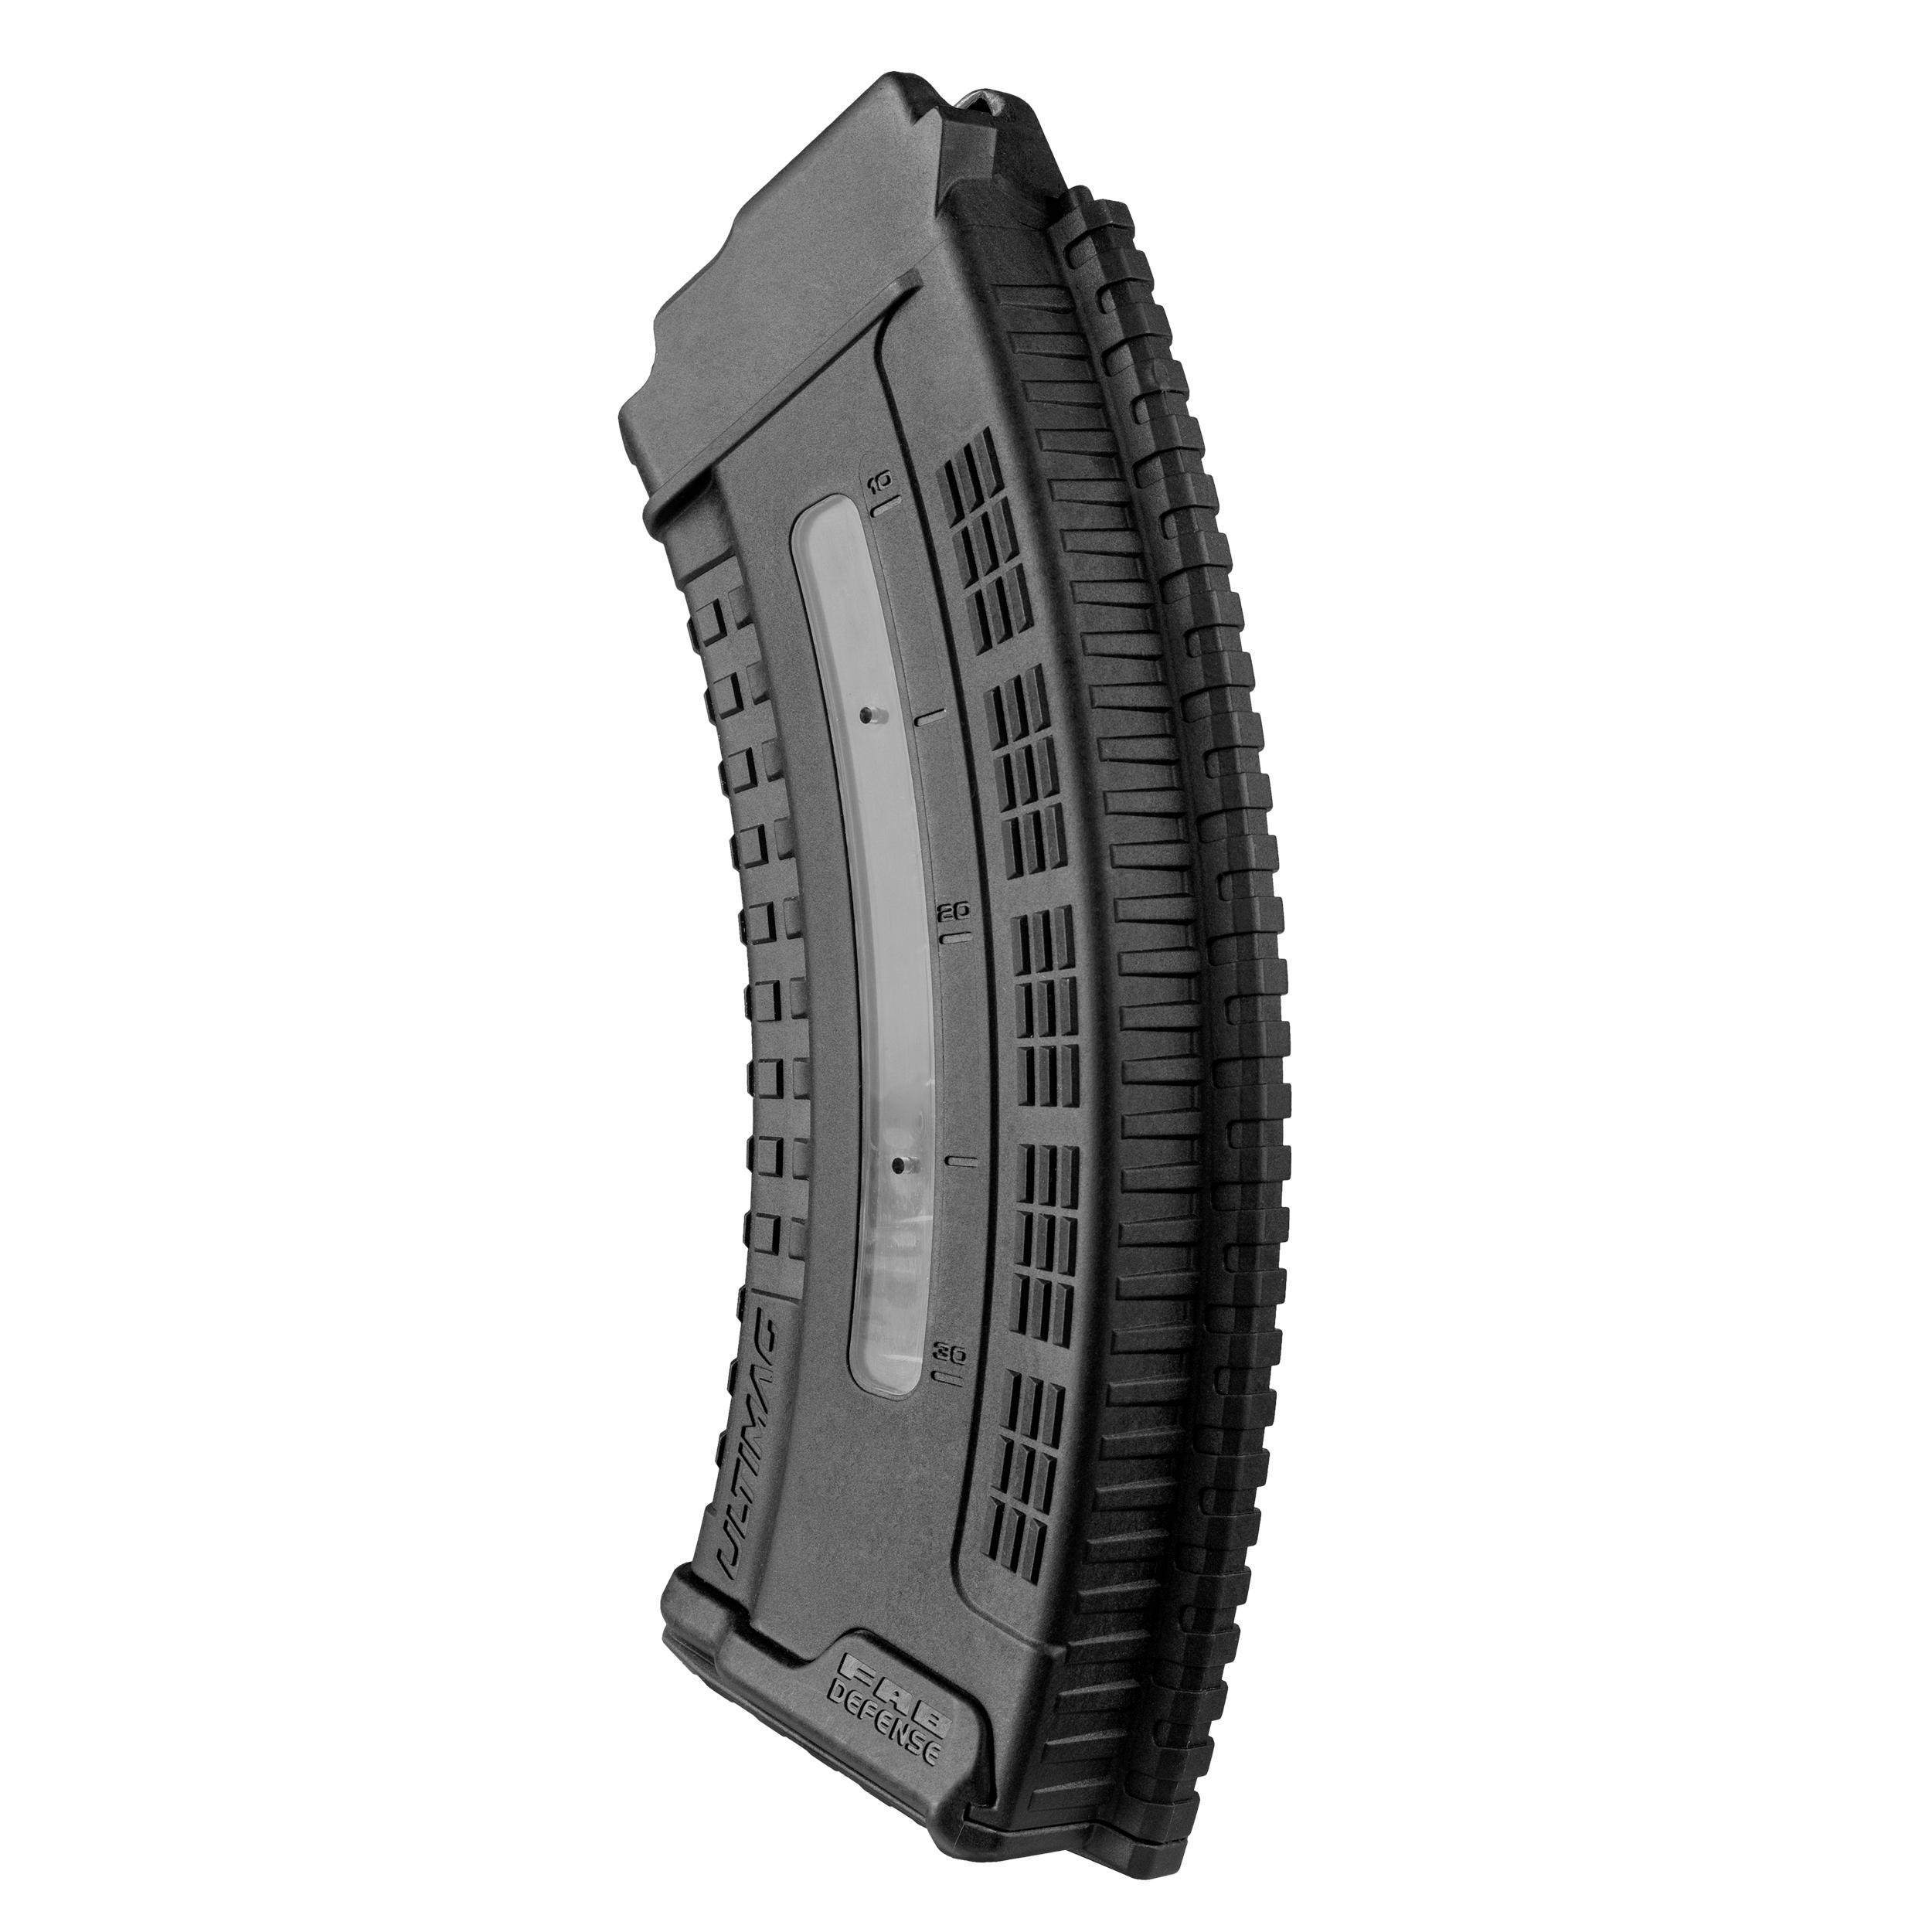 VZ.58 7.62X39 30 Rounds Polymer Magazine